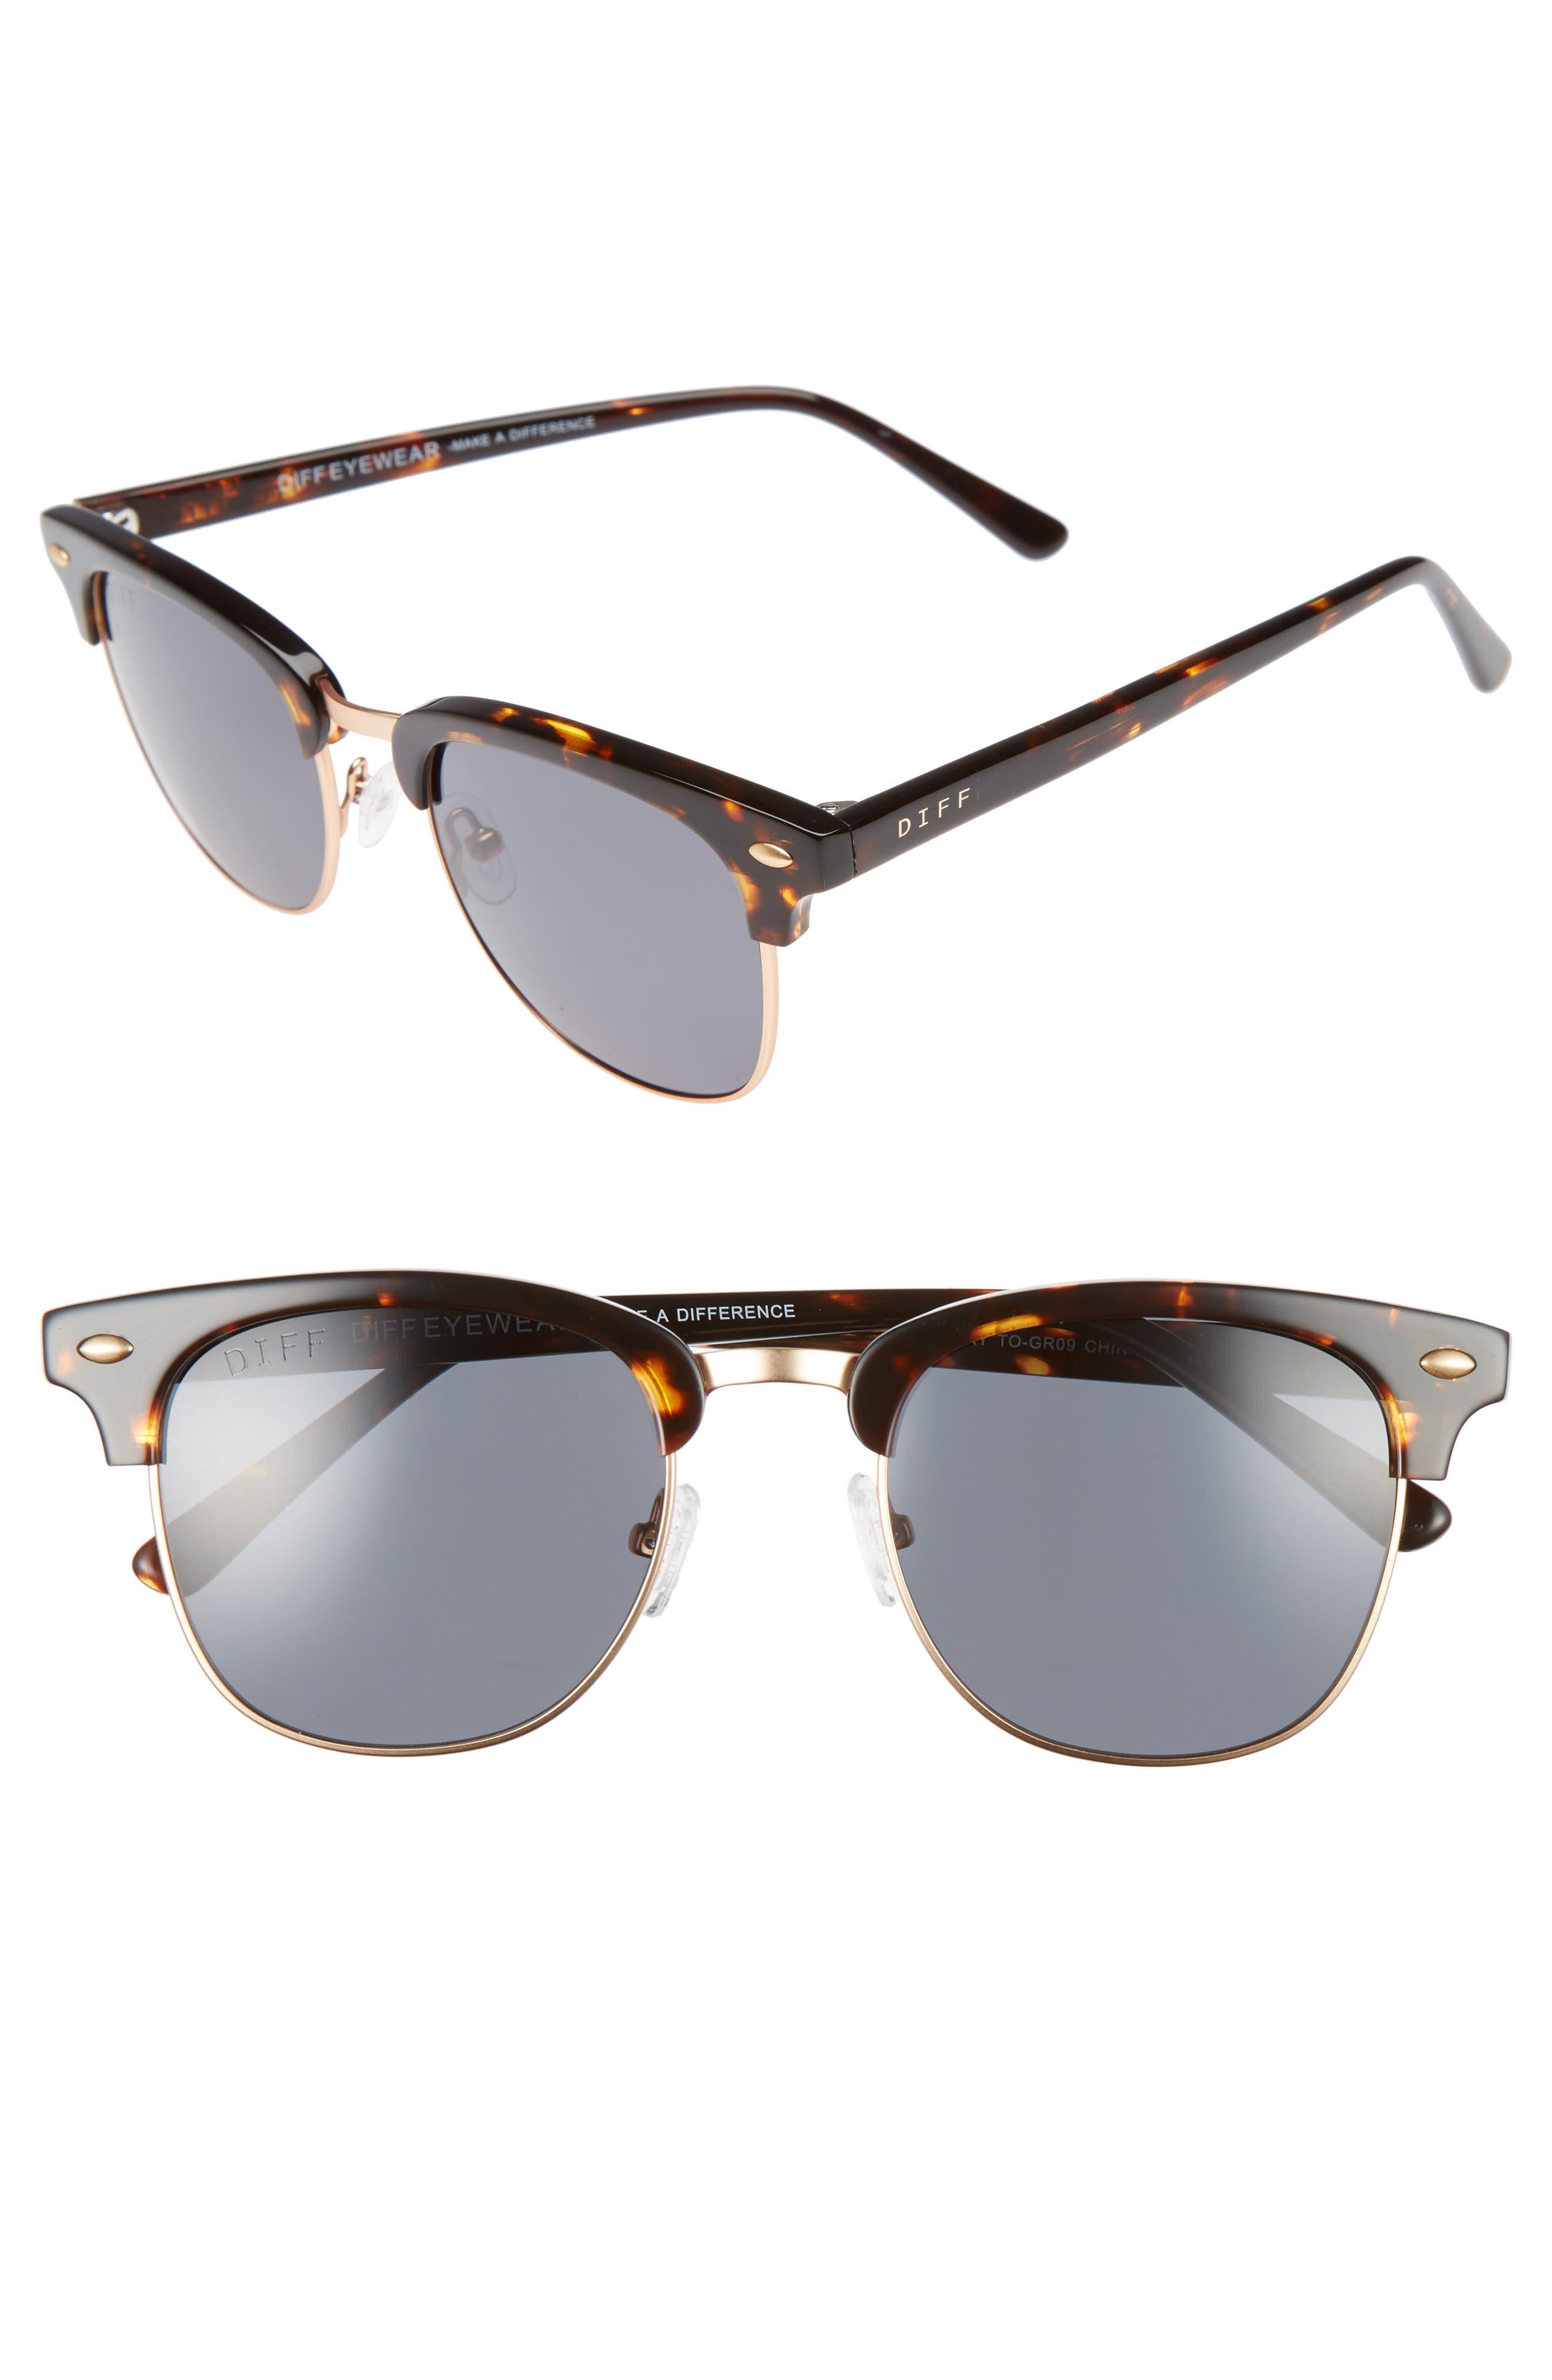 Barry 51mm Polarized Retro Sunglasses,                             Main thumbnail 5, color,